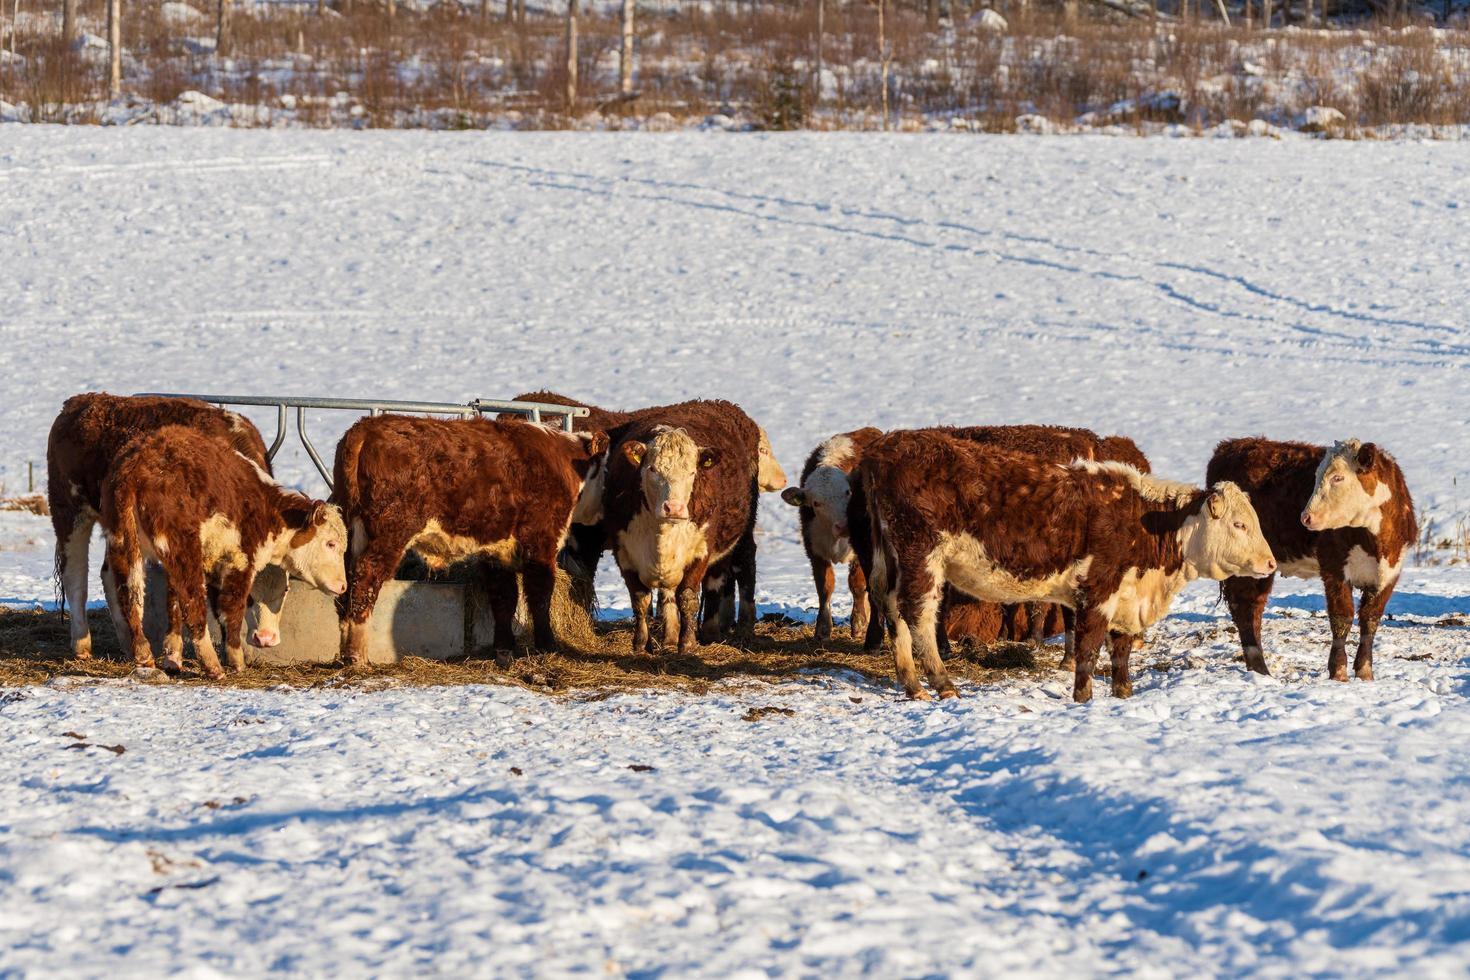 flock kor som står i snön i en vinterhage i sverige foto